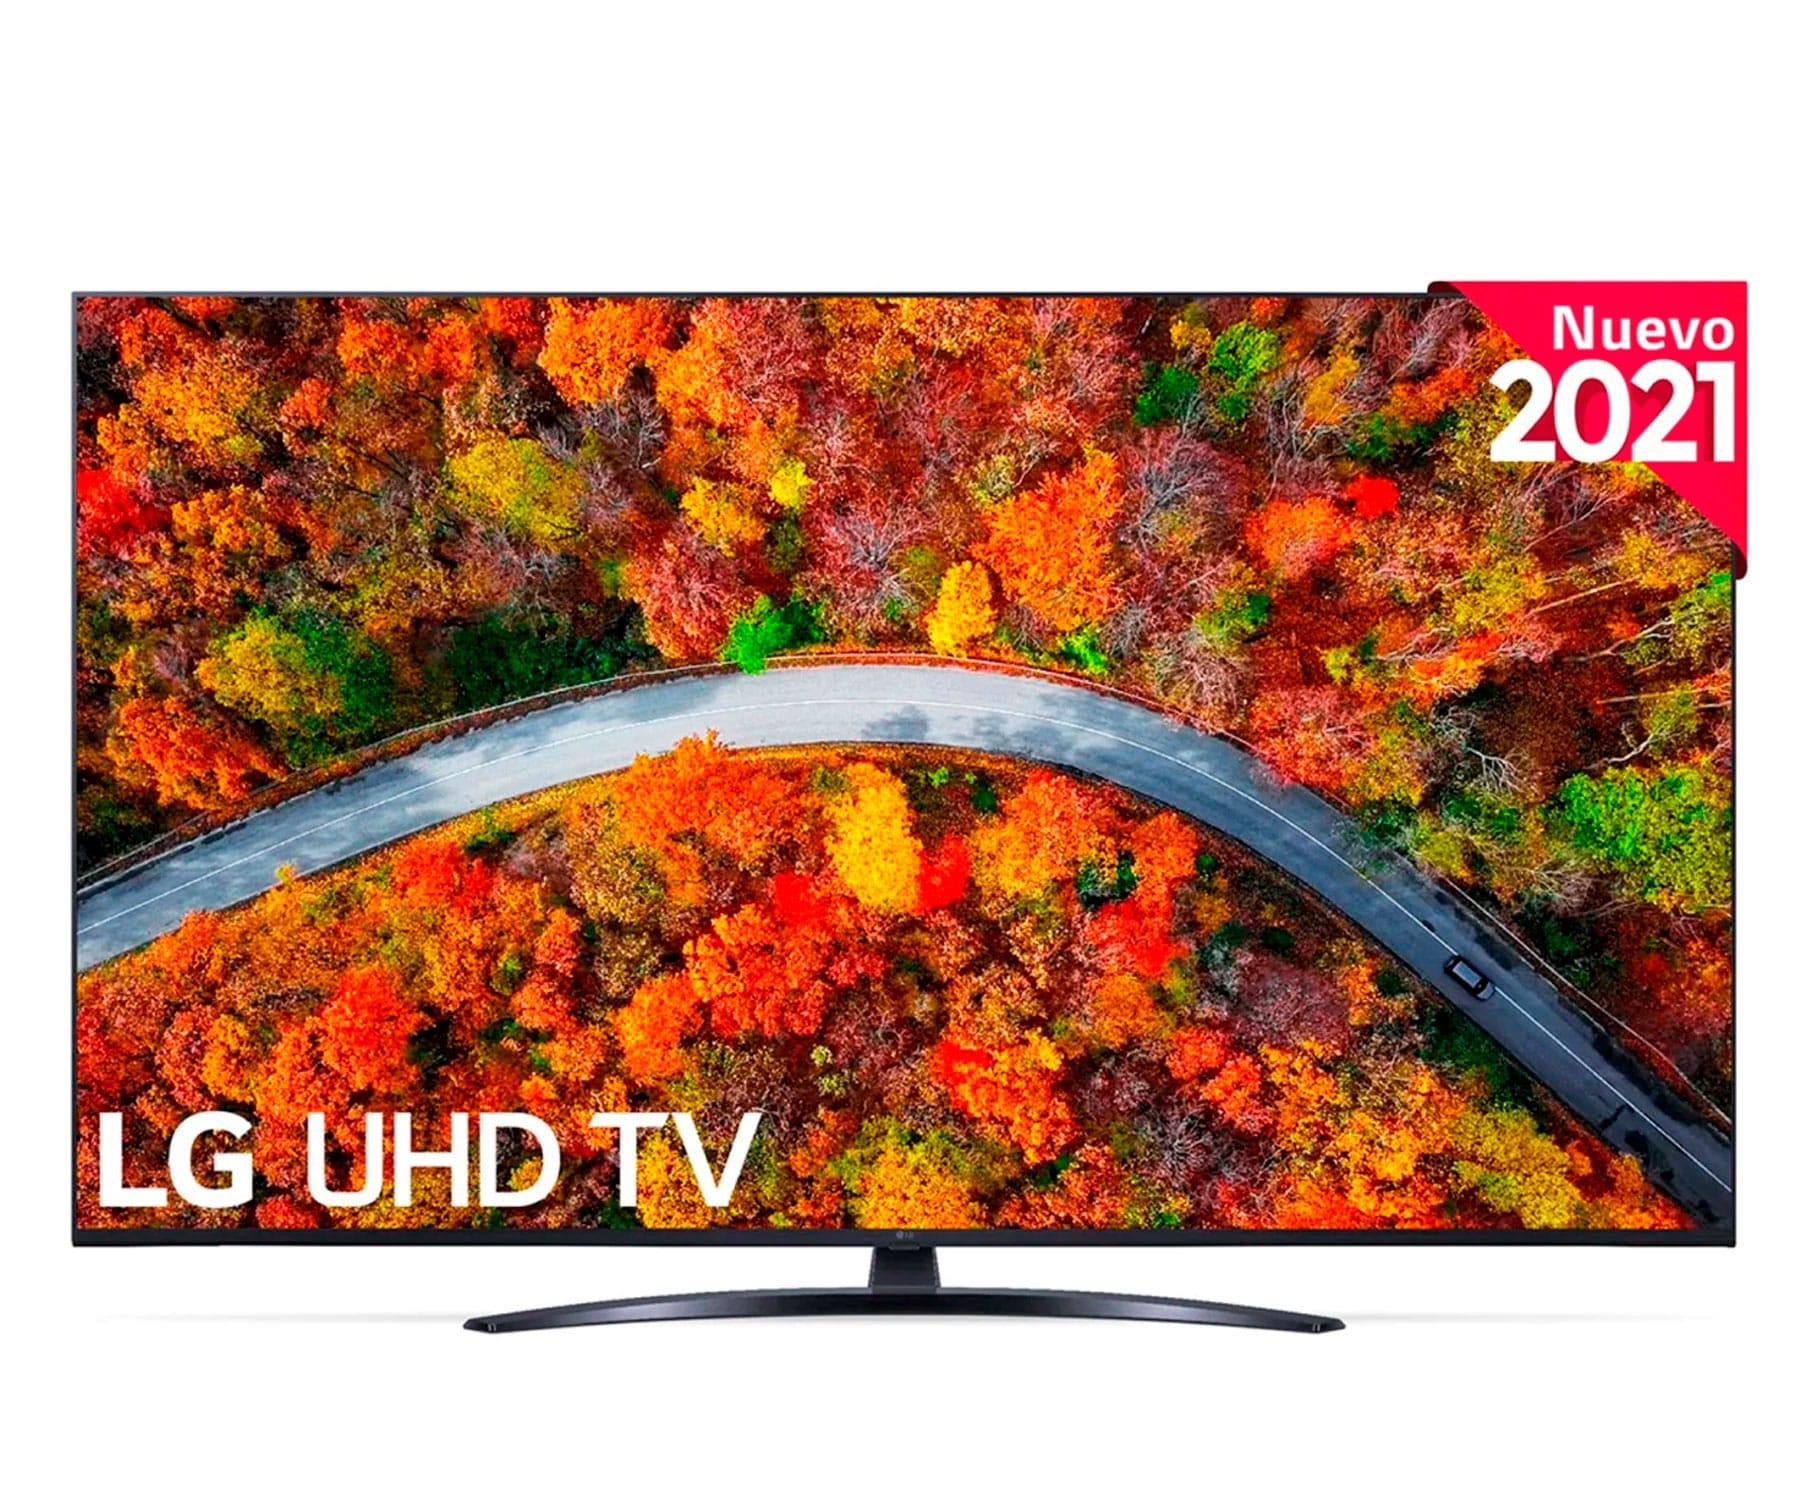 LG 65UP81006LA TELEVISOR 65'' LED UHD 4K SMART TV WEBOS 6.0 WIFI HDMI BLUETOOTH